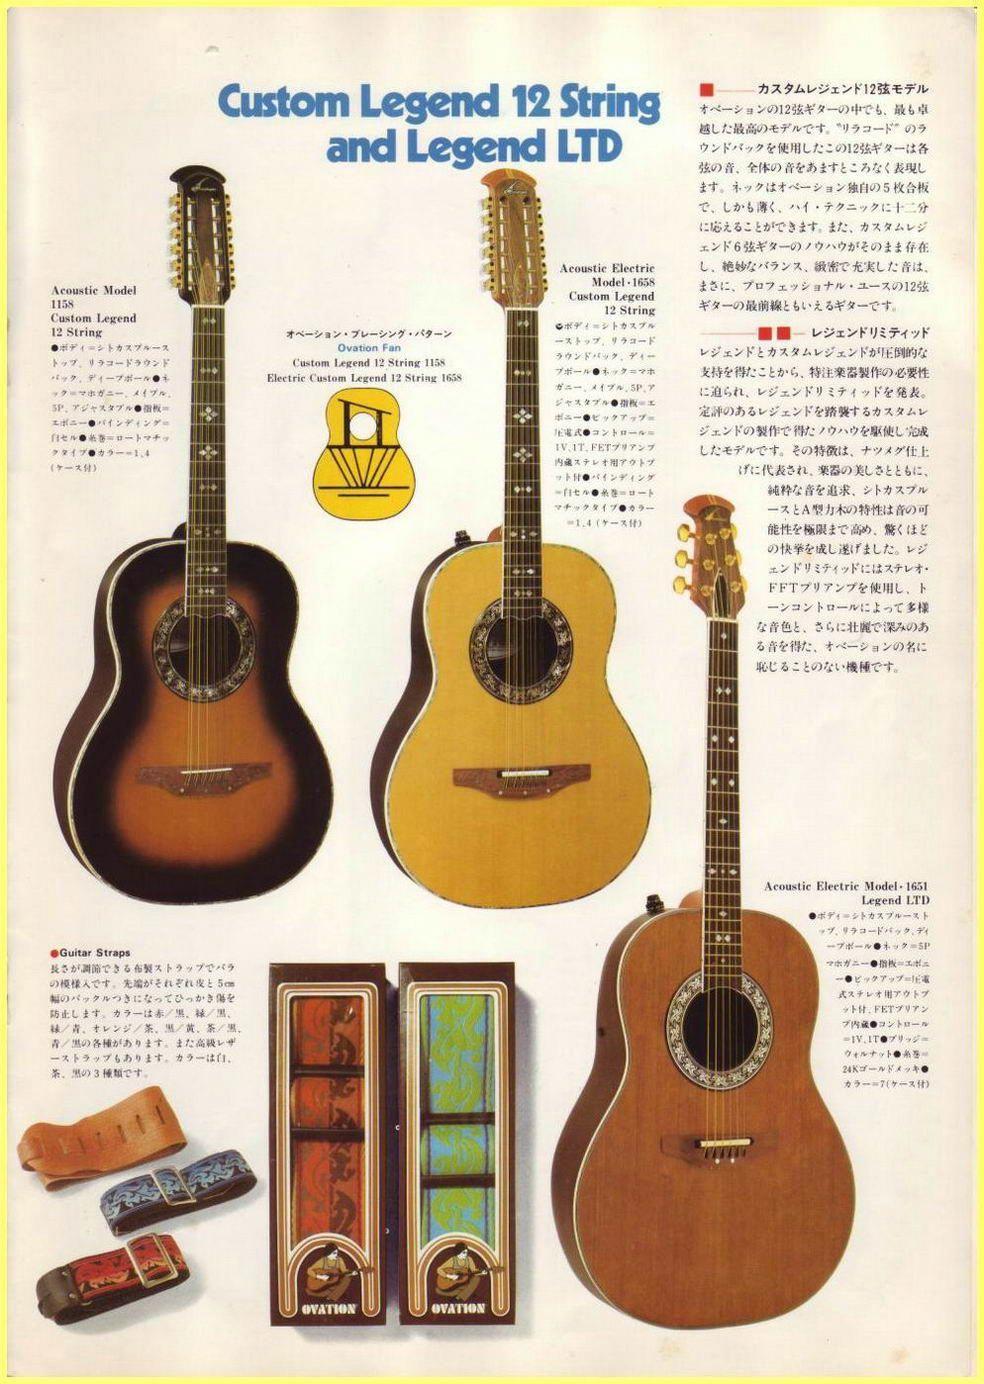 16 Sensational Ovation Guitars Black Ovation Guitars Koa Guitarpedals Guitarmusic Ovationguitars Ovation Guitar Guitar Learn Guitar